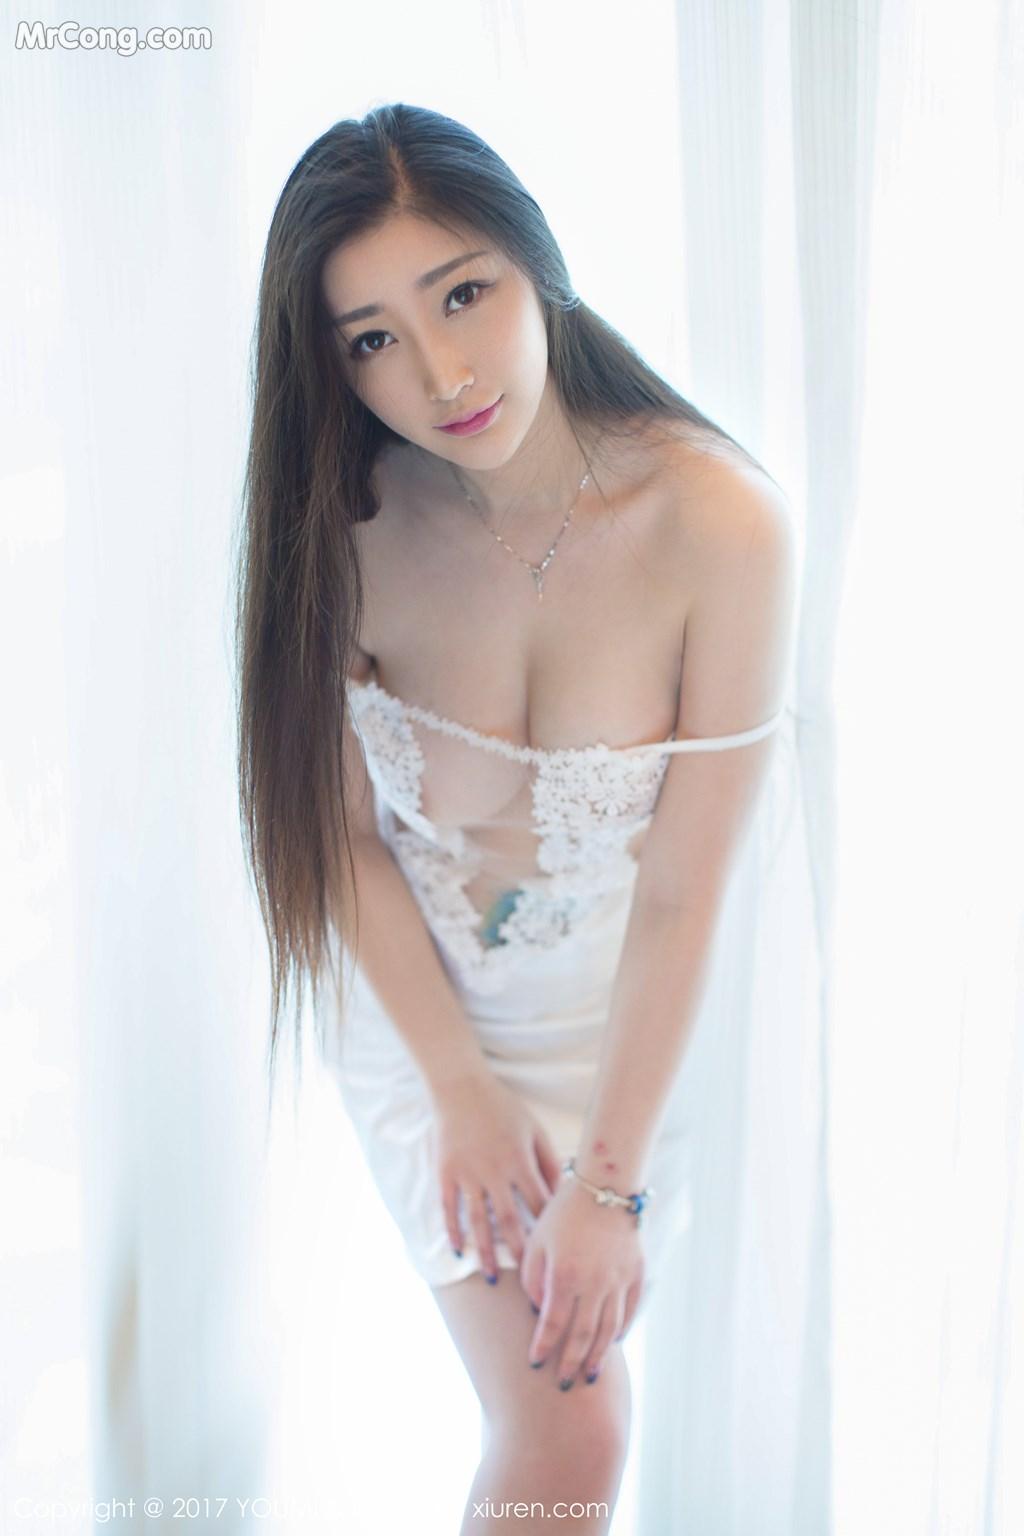 Image YouMi-Vol.077-Daji-Toxic-MrCong.com-042 in post YouMi Vol.077: Người mẫu Daji_Toxic (妲己_Toxic) (49 ảnh)